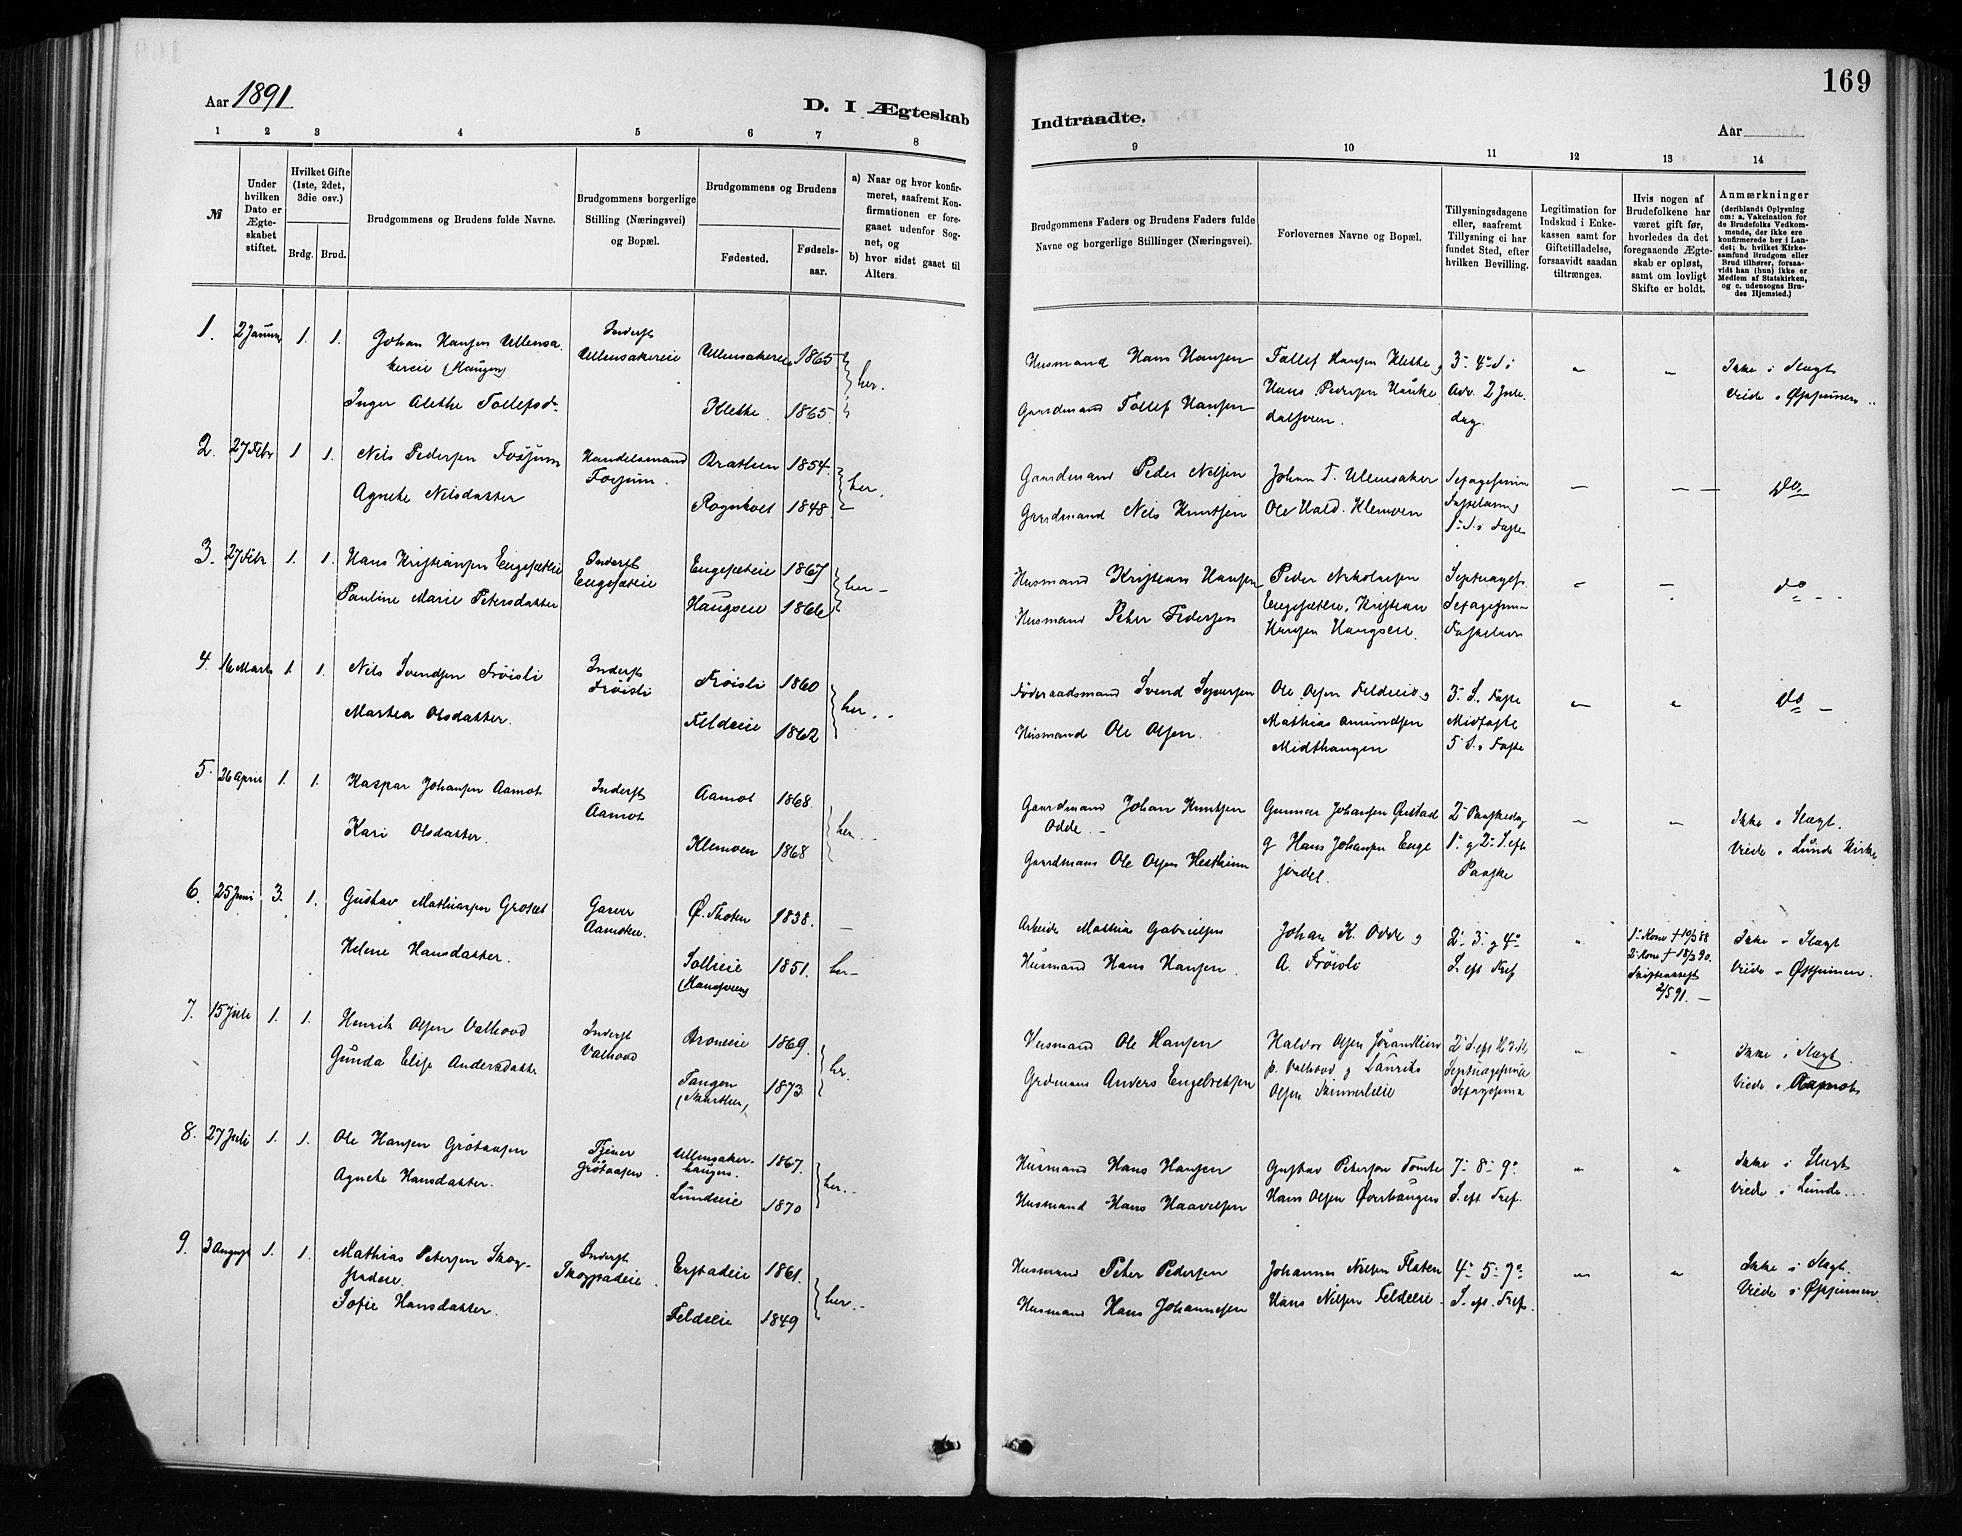 SAH, Nordre Land prestekontor, Ministerialbok nr. 4, 1882-1896, s. 169